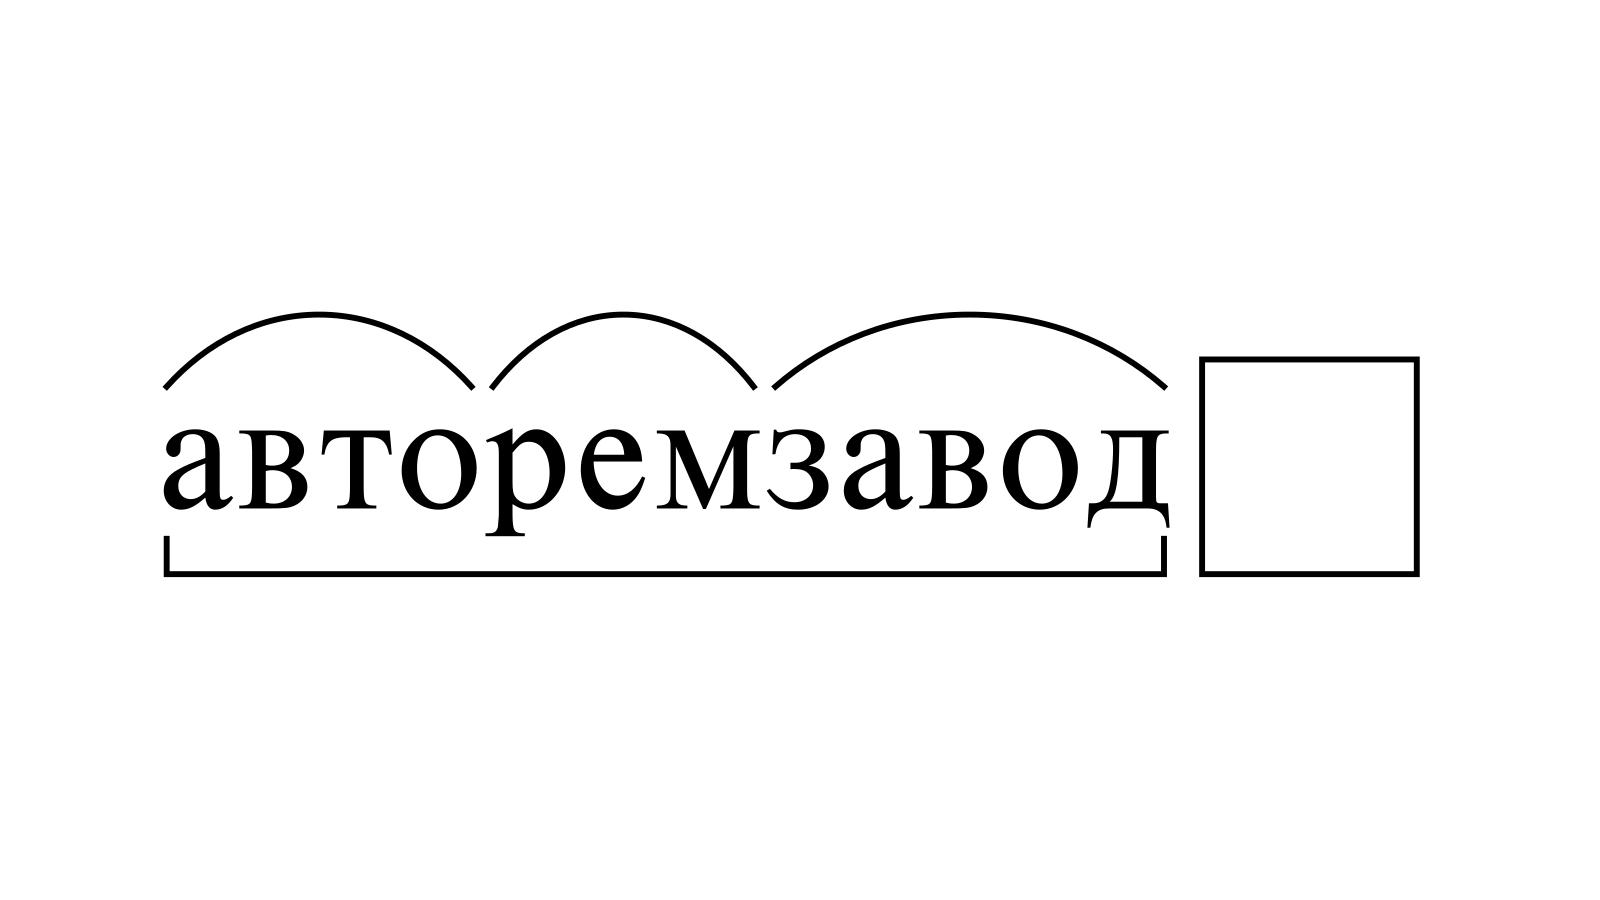 Разбор слова «авторемзавод» по составу